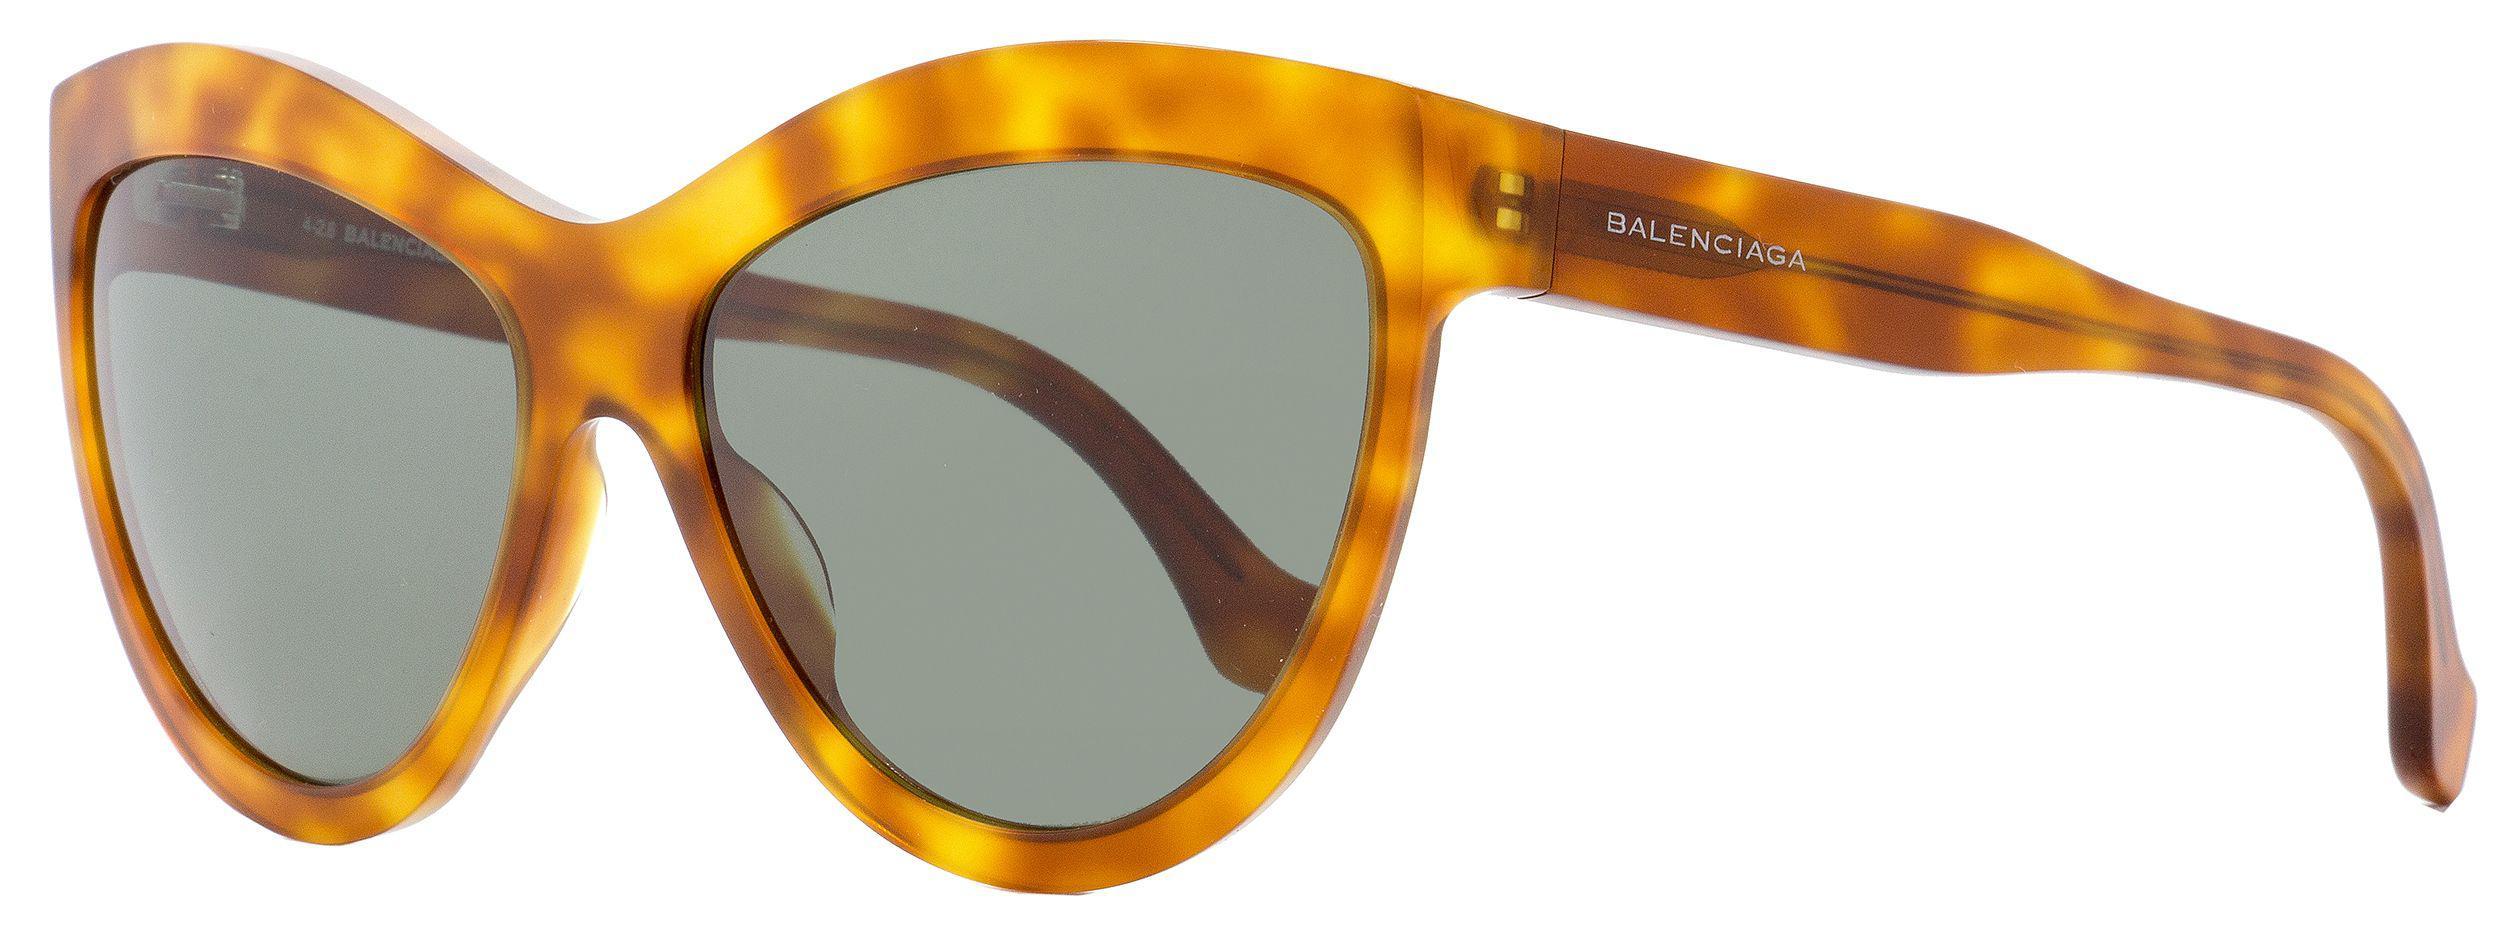 ed74155afc78 Lyst - Balenciaga Cateye Sunglasses Ba90 53n Blonde Havana 60mm ...